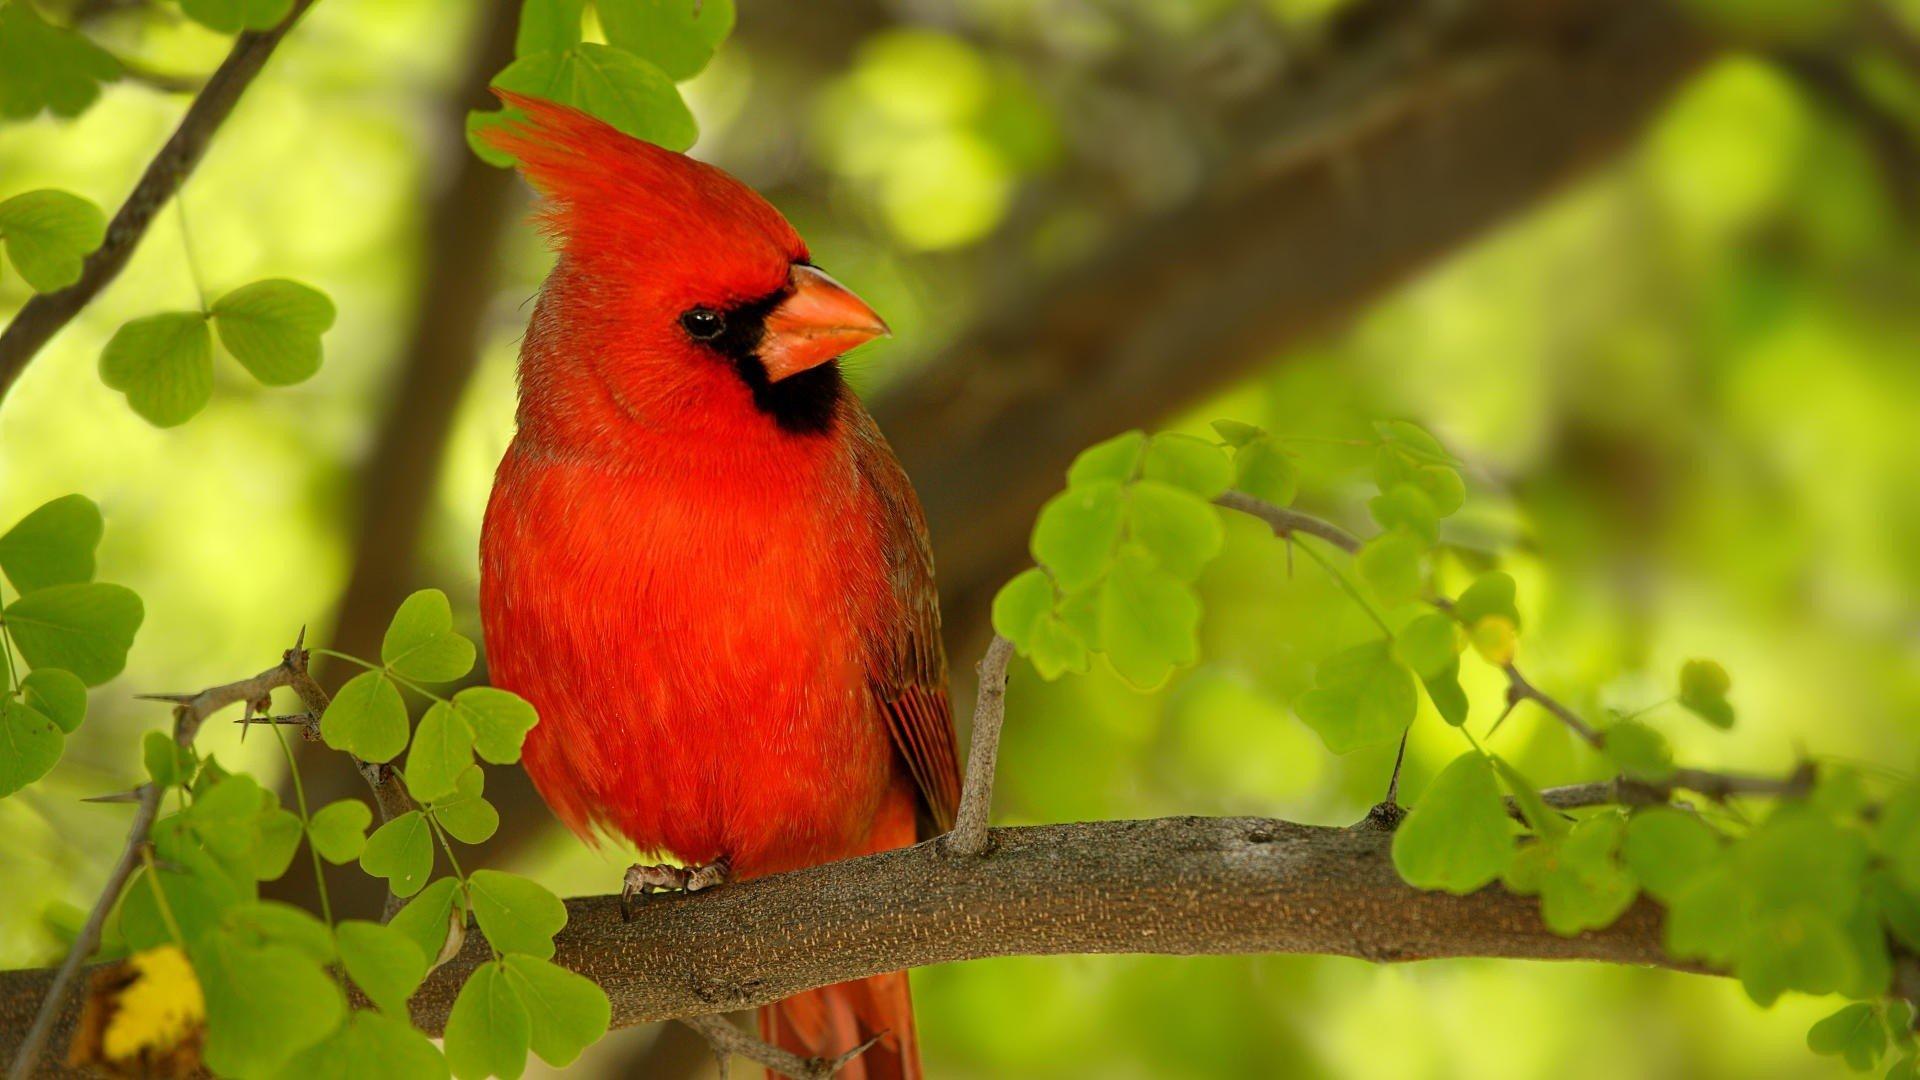 Happy Quotes Iphone Wallpaper Free Download Cardinal Background Pixelstalk Net